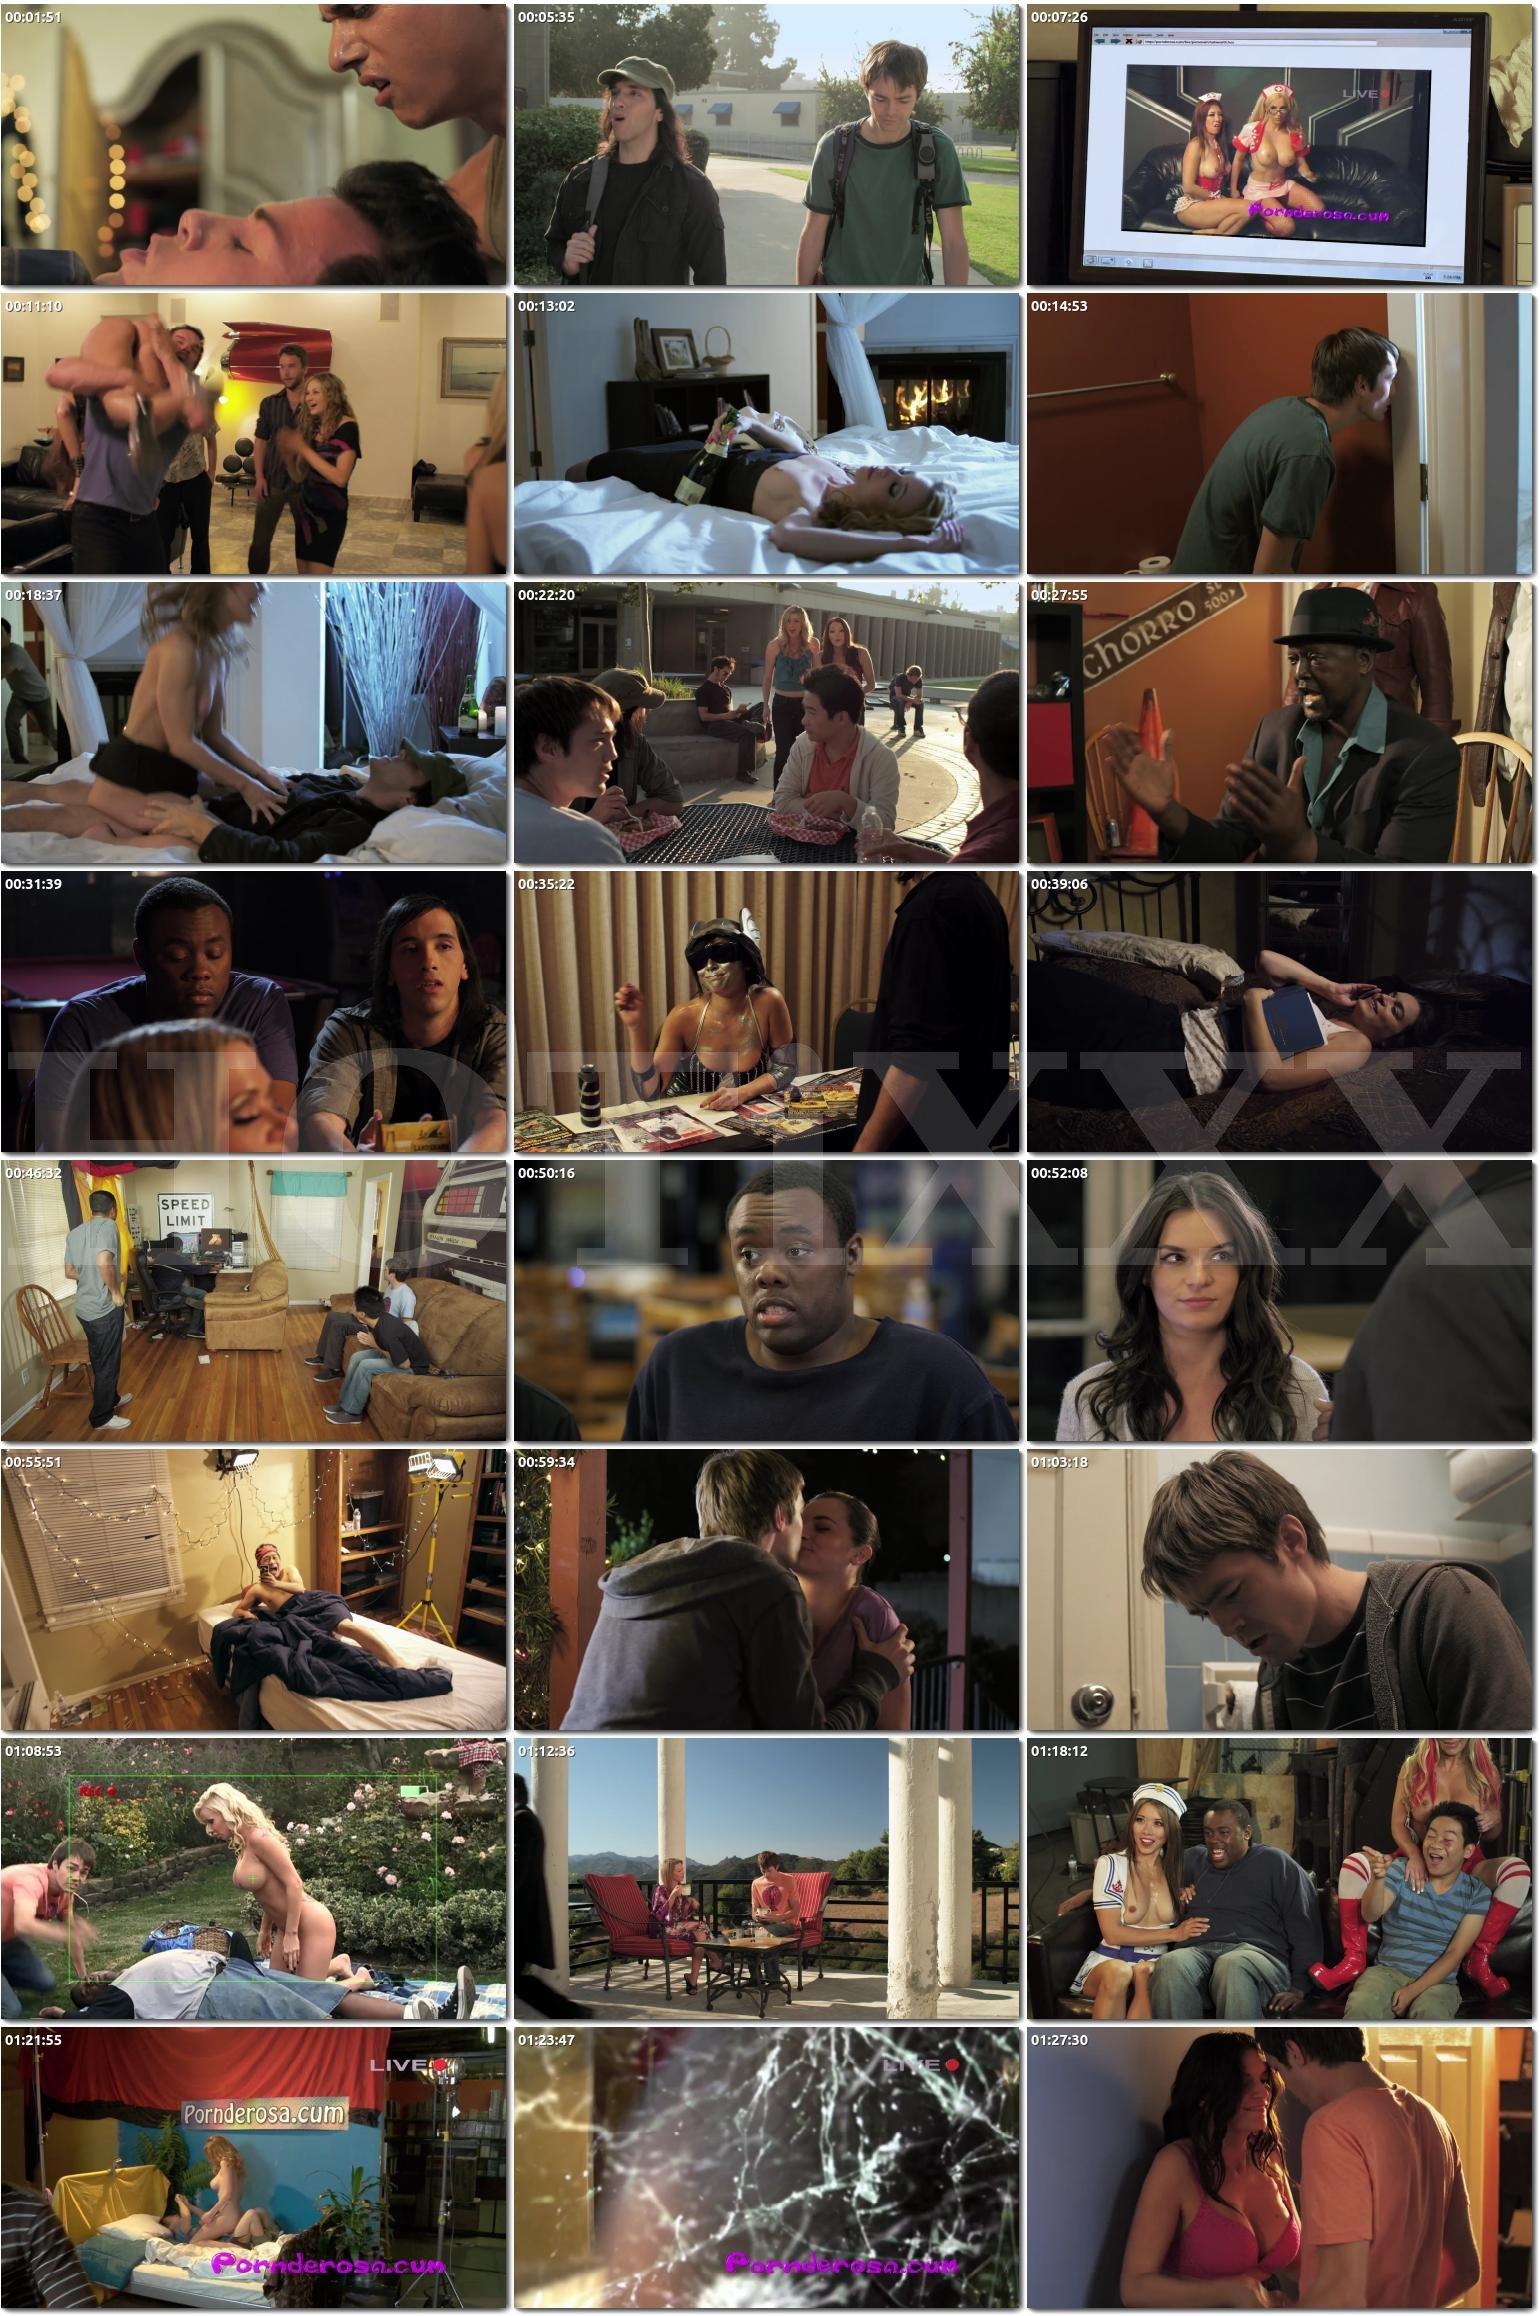 bolshie-popi-porno-filmi